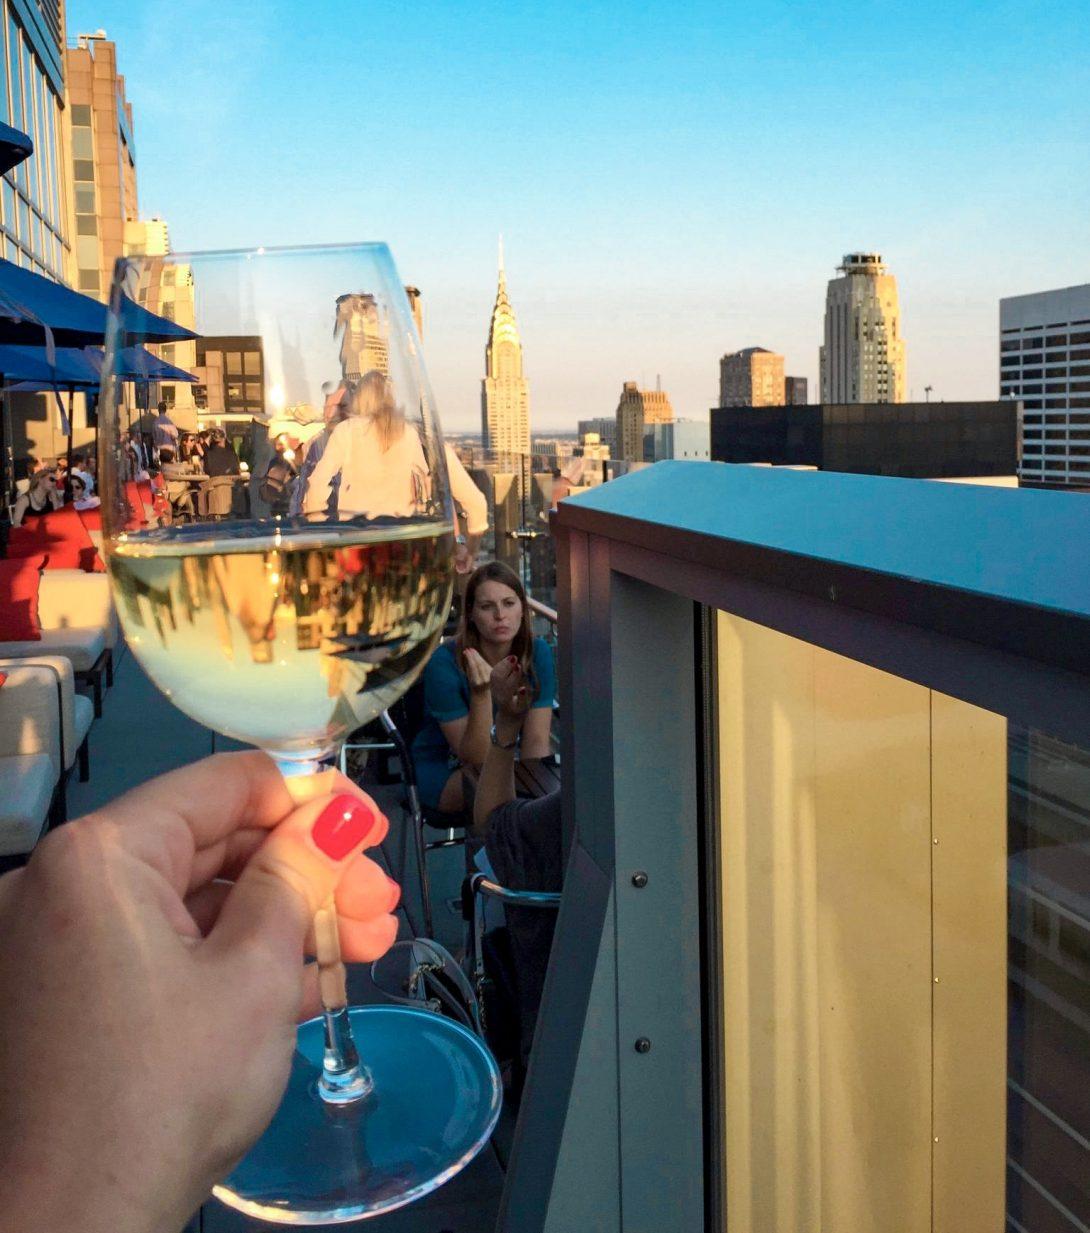 Bar 54 Hyatt hotel New York